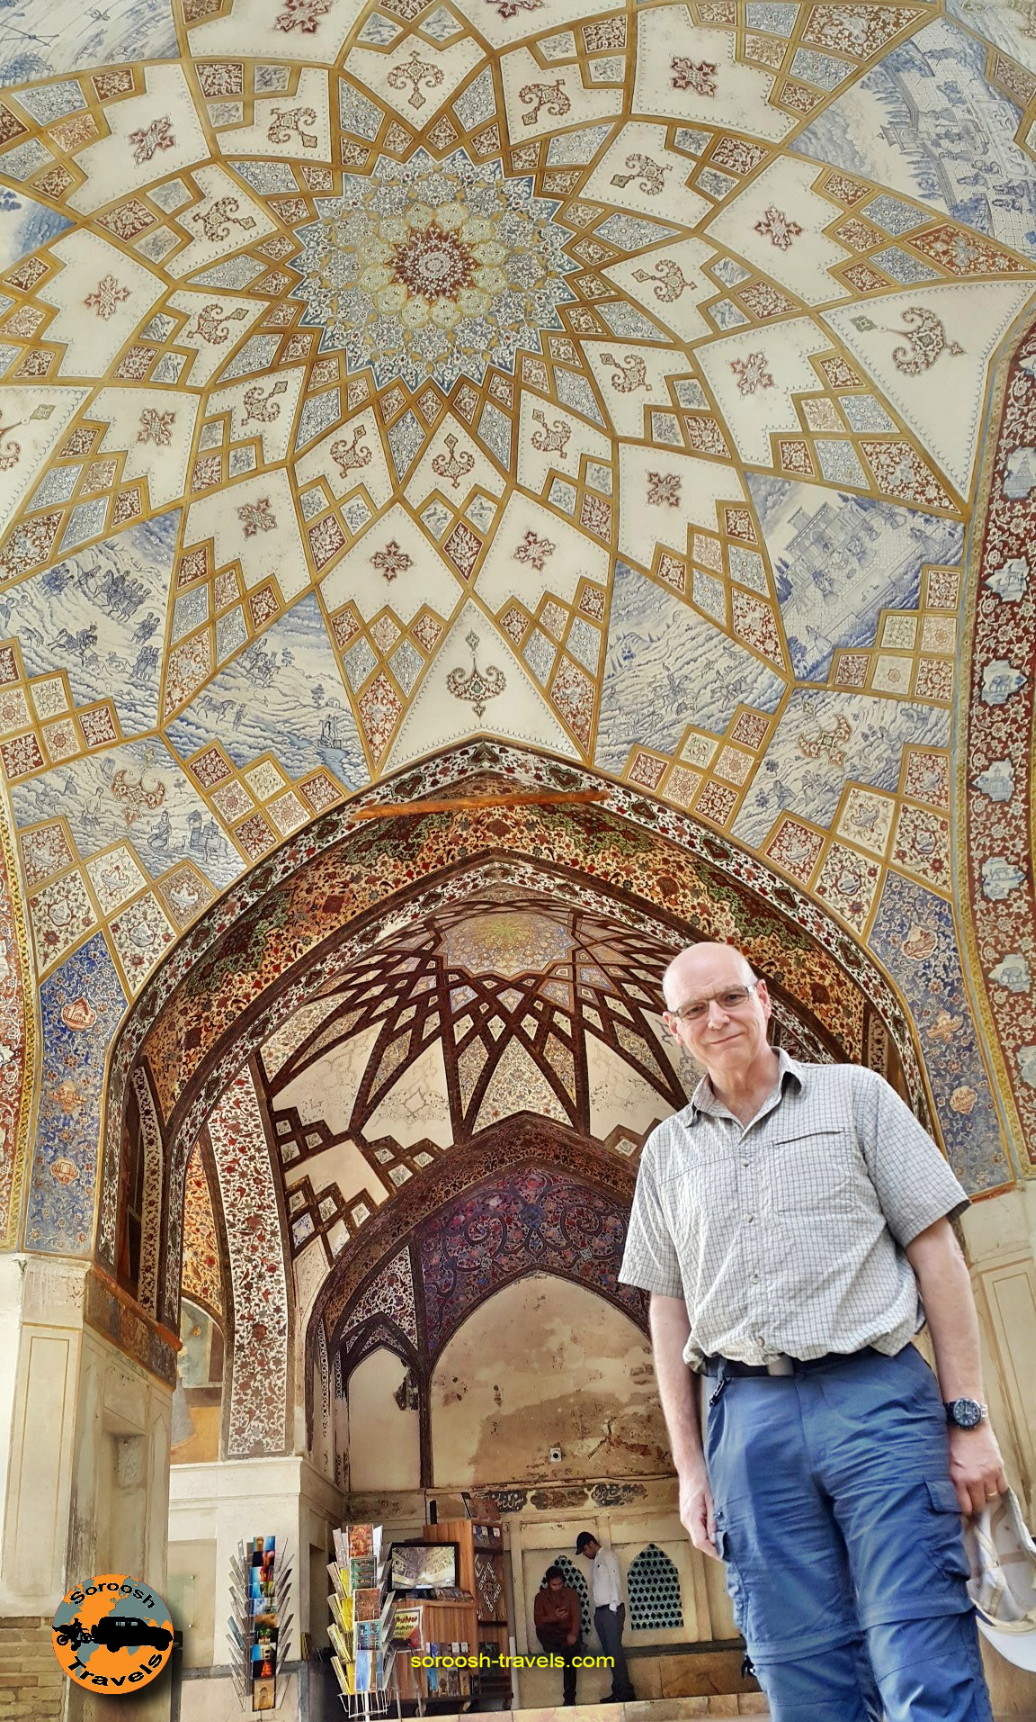 باغ فین کاشان - مهرماه 1395